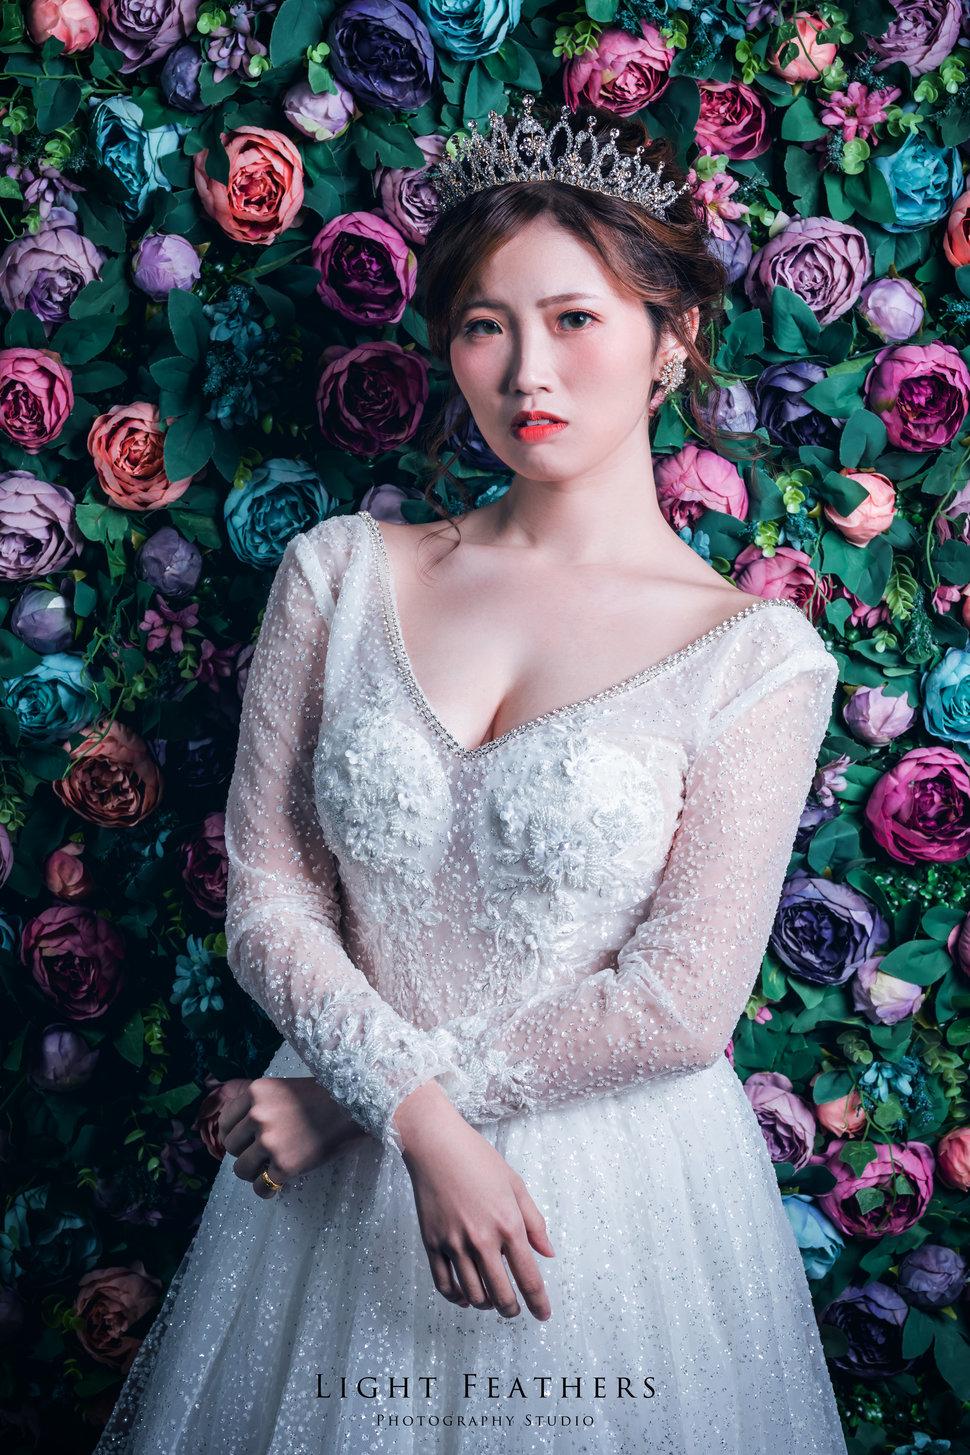 5D4_1181 - Promaker婚禮紀錄攝影團隊婚攝豪哥《結婚吧》